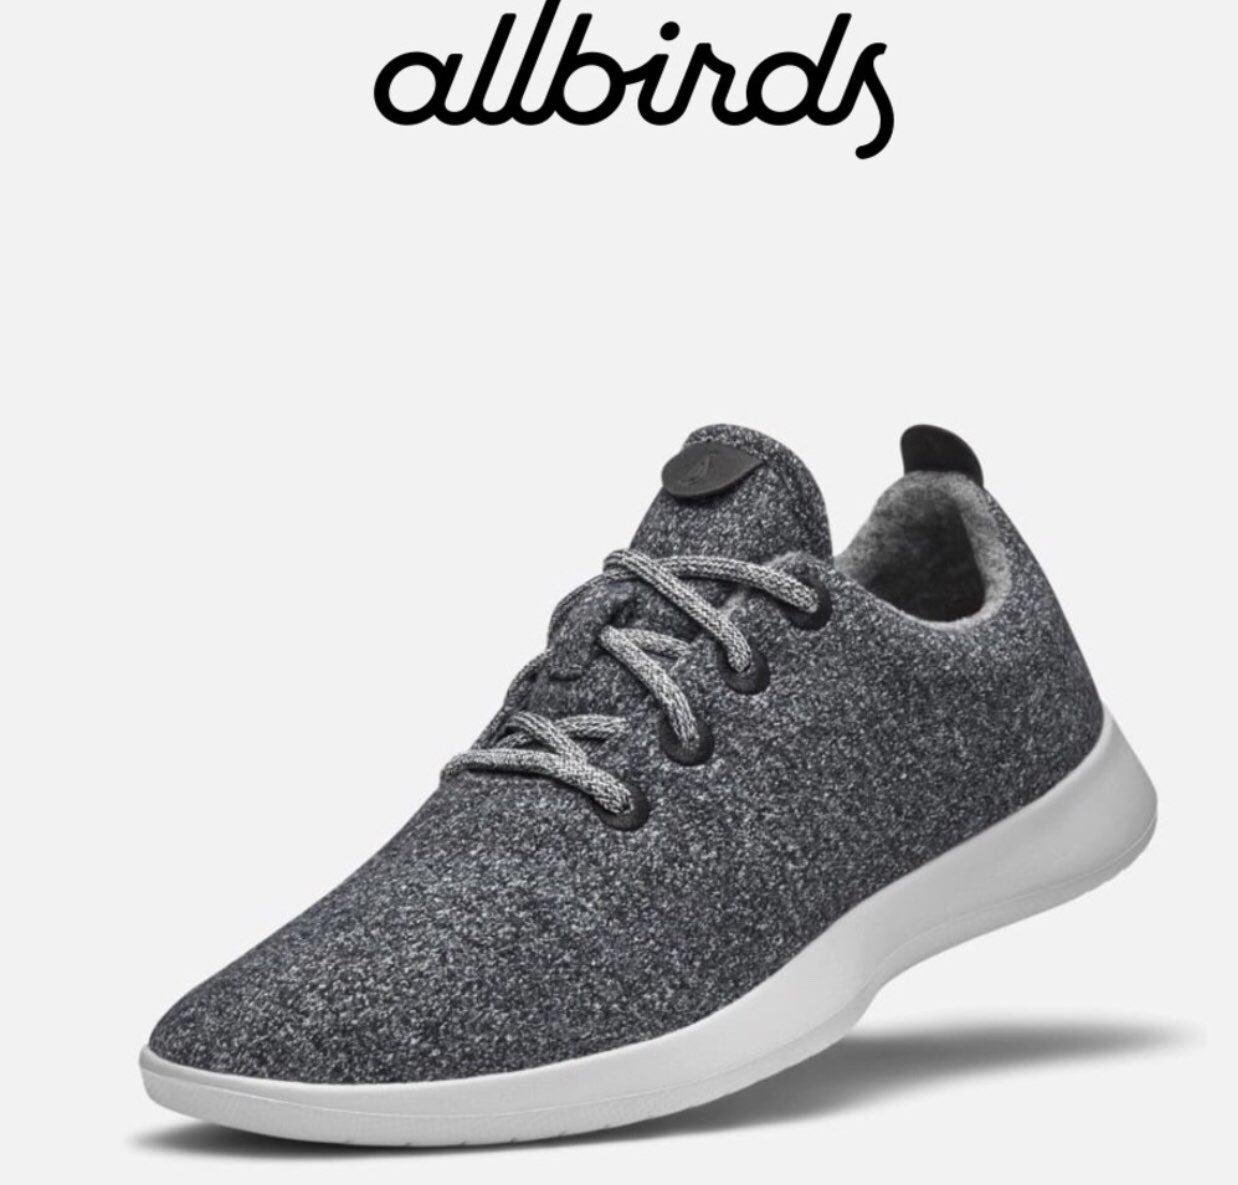 Allbirds Men's Dark Gray Wool Runners